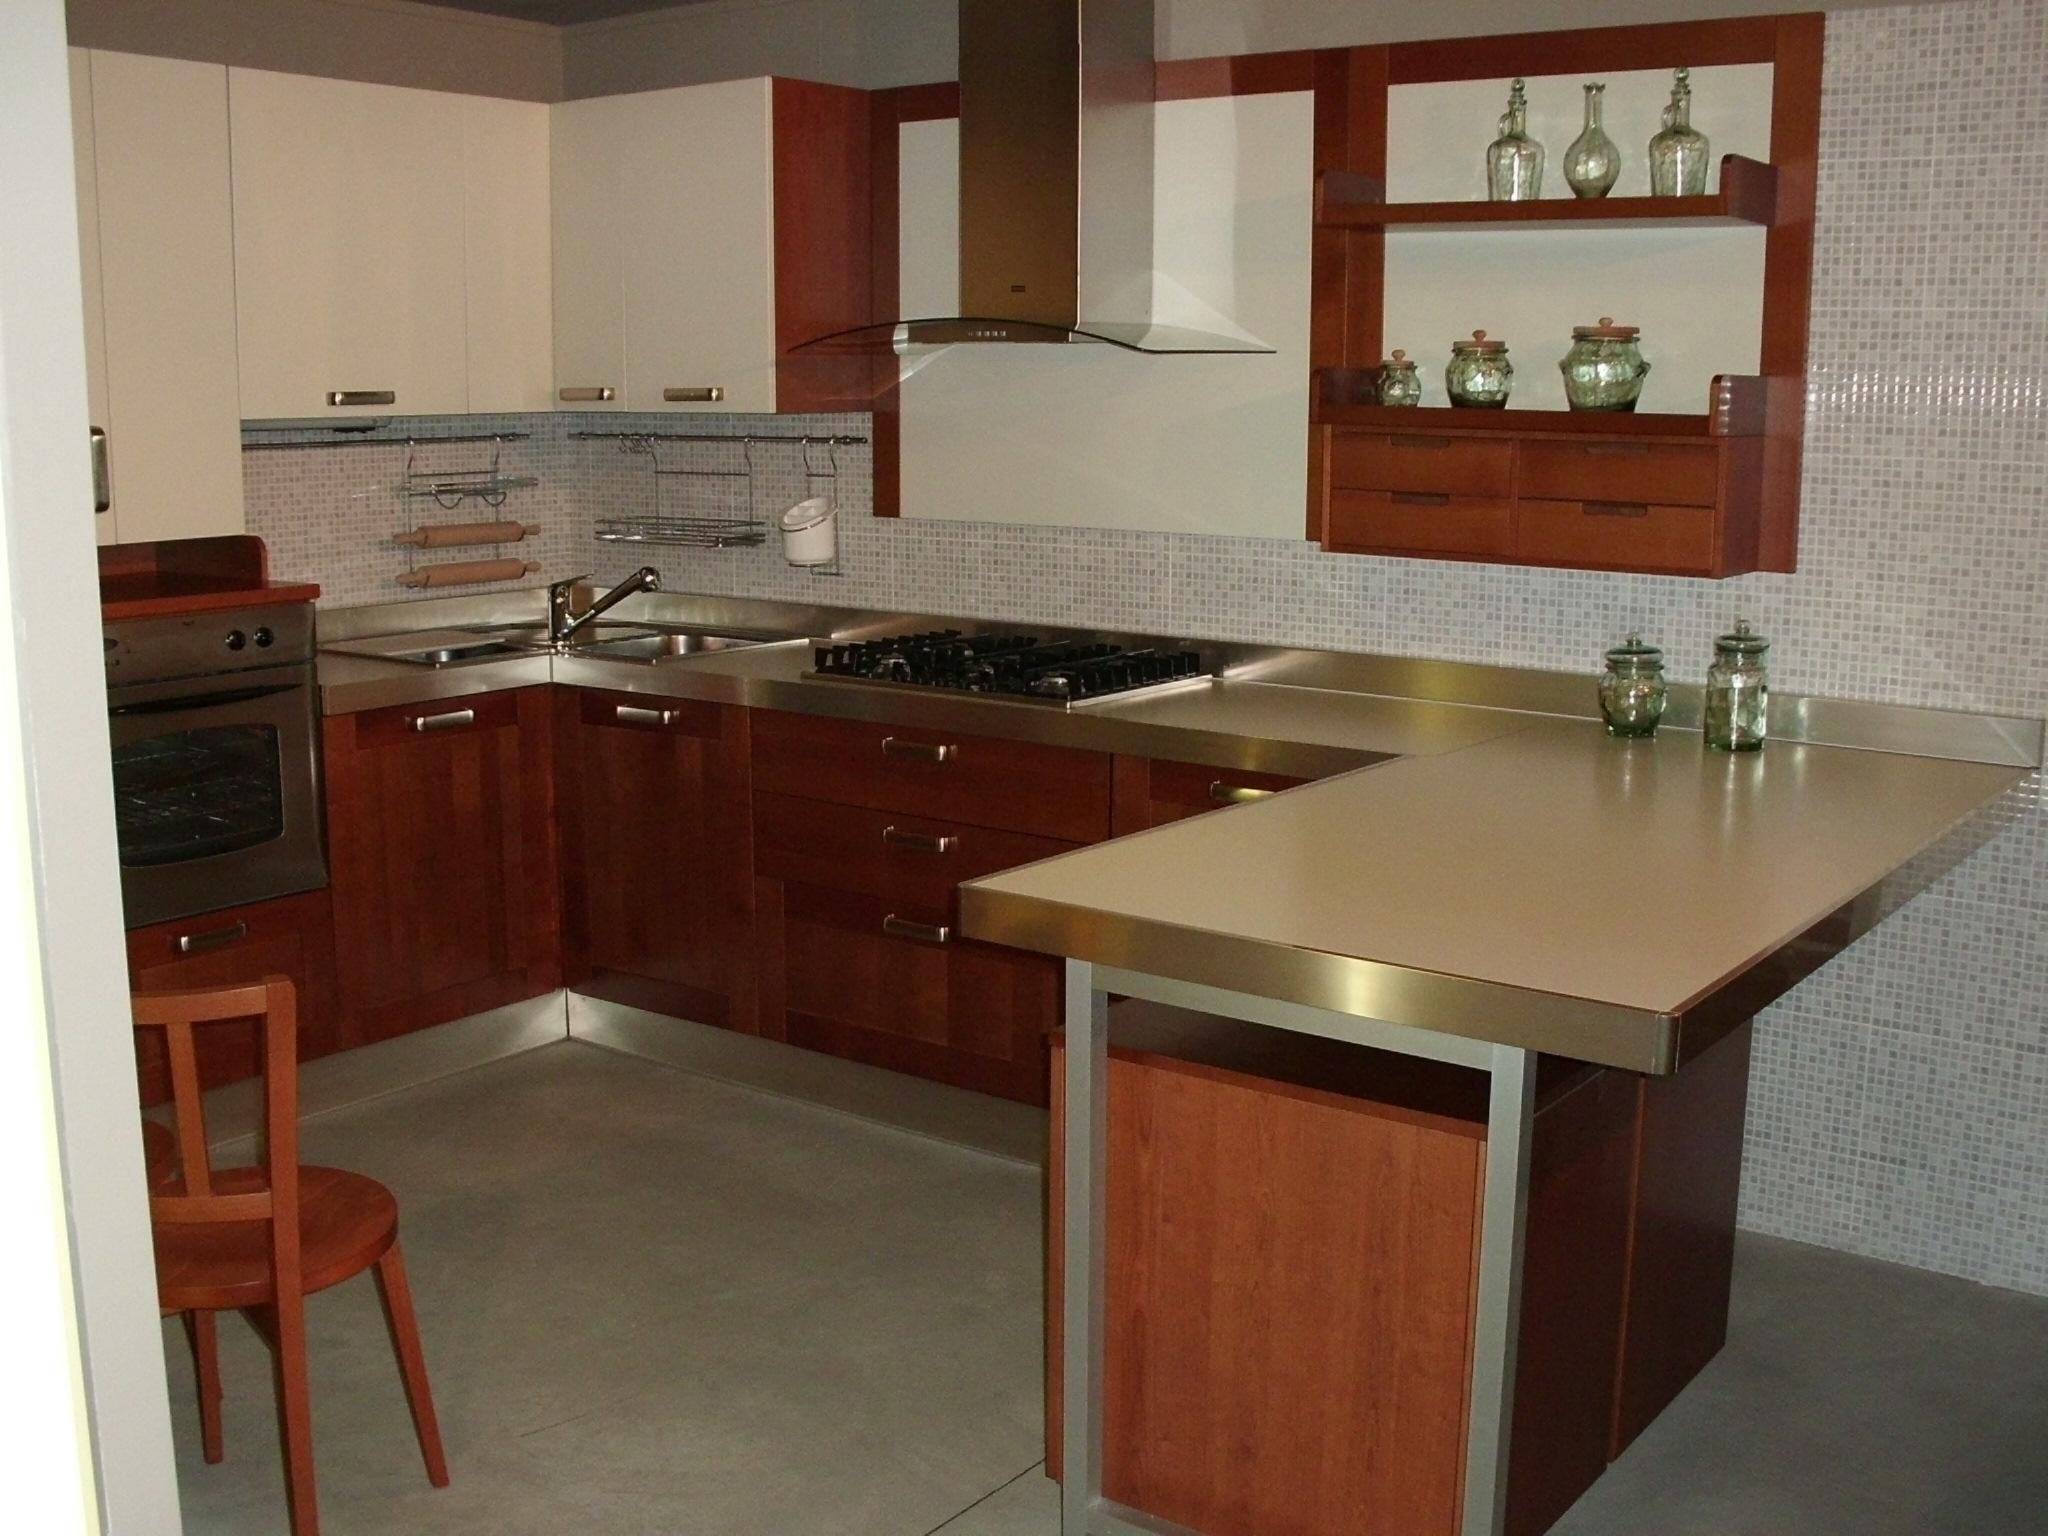 Cucine Lissone Outlet. Affordable Cucina Gicinque Mod Joy Prezzo ...